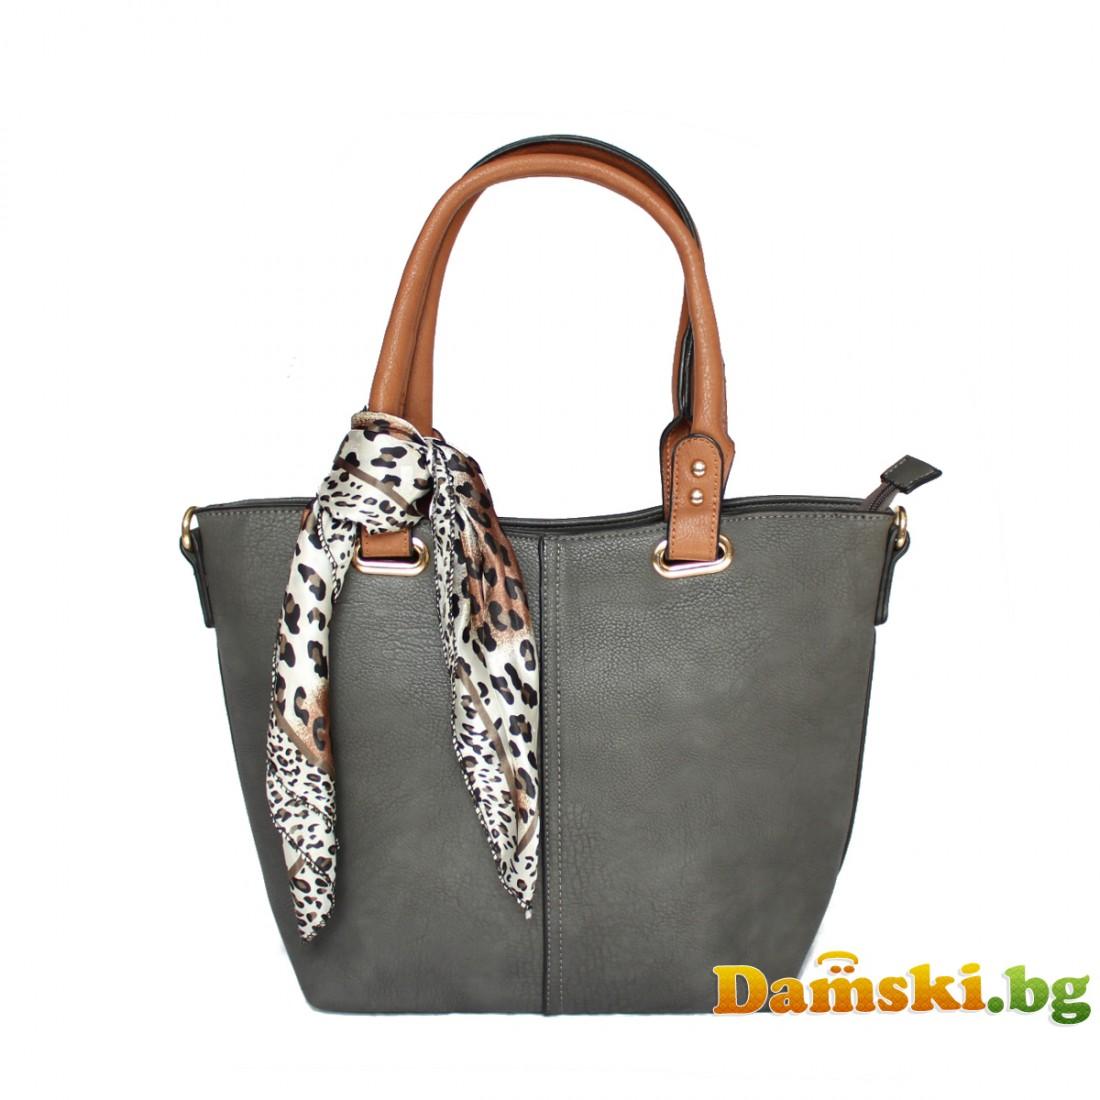 Елегантна дамска чанта Лейди - сива